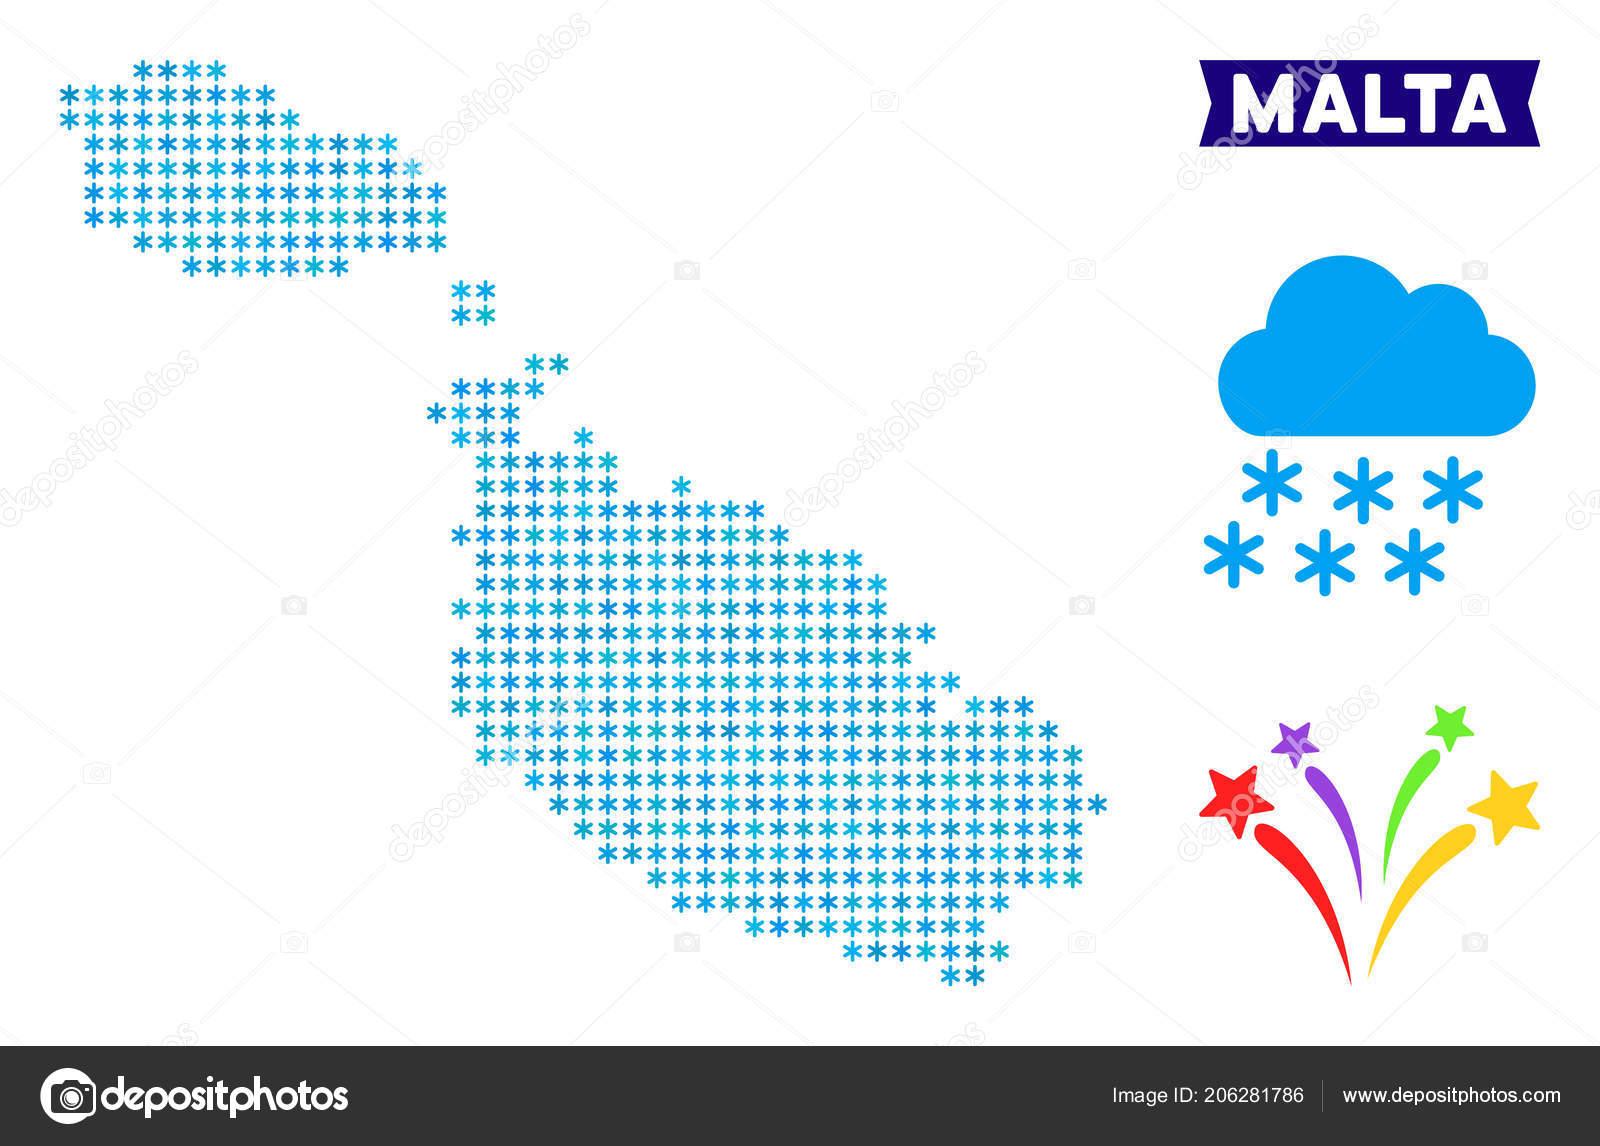 Frozen Malta Island Map — Stock Vector © ahasoft #206281786 on san marino, malta people, malta region map, malta points of interest, malta street map, malta weather, malta russia map, emma heming, malta beaches, malta portugal map, cape verde islands map, malta capital map, italy map, maltese map, st.julians malta map, paul in malta map, malta bus route map, malta popeye s, malta climate map, malaysia map, sliema malta map,